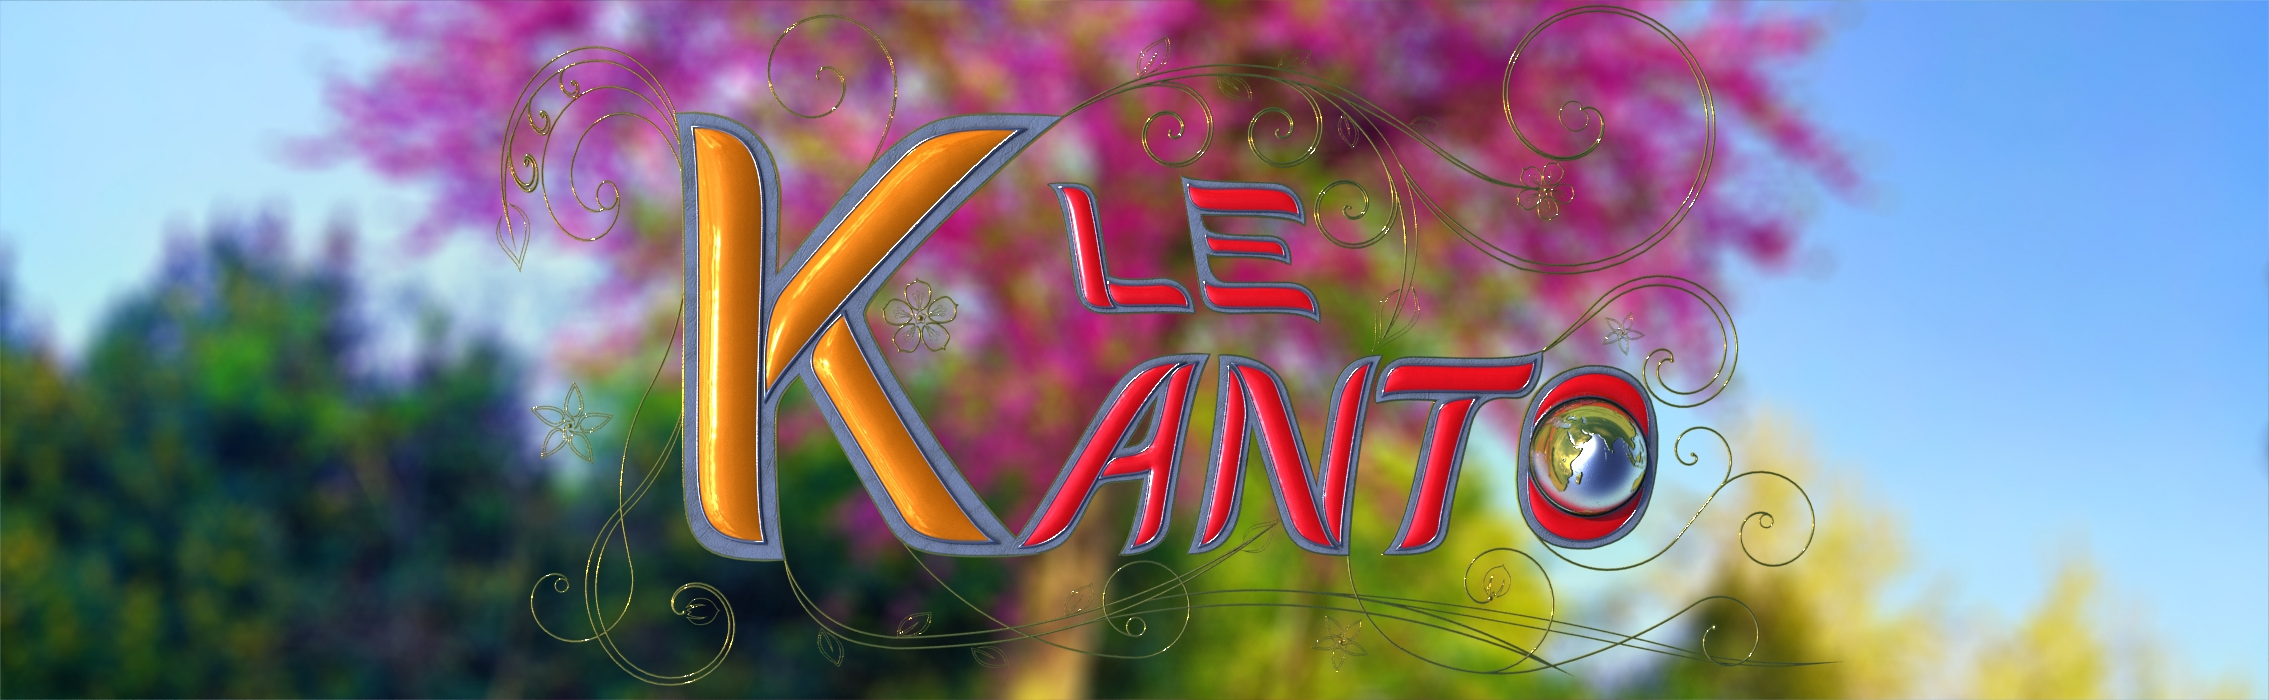 Le Kanto